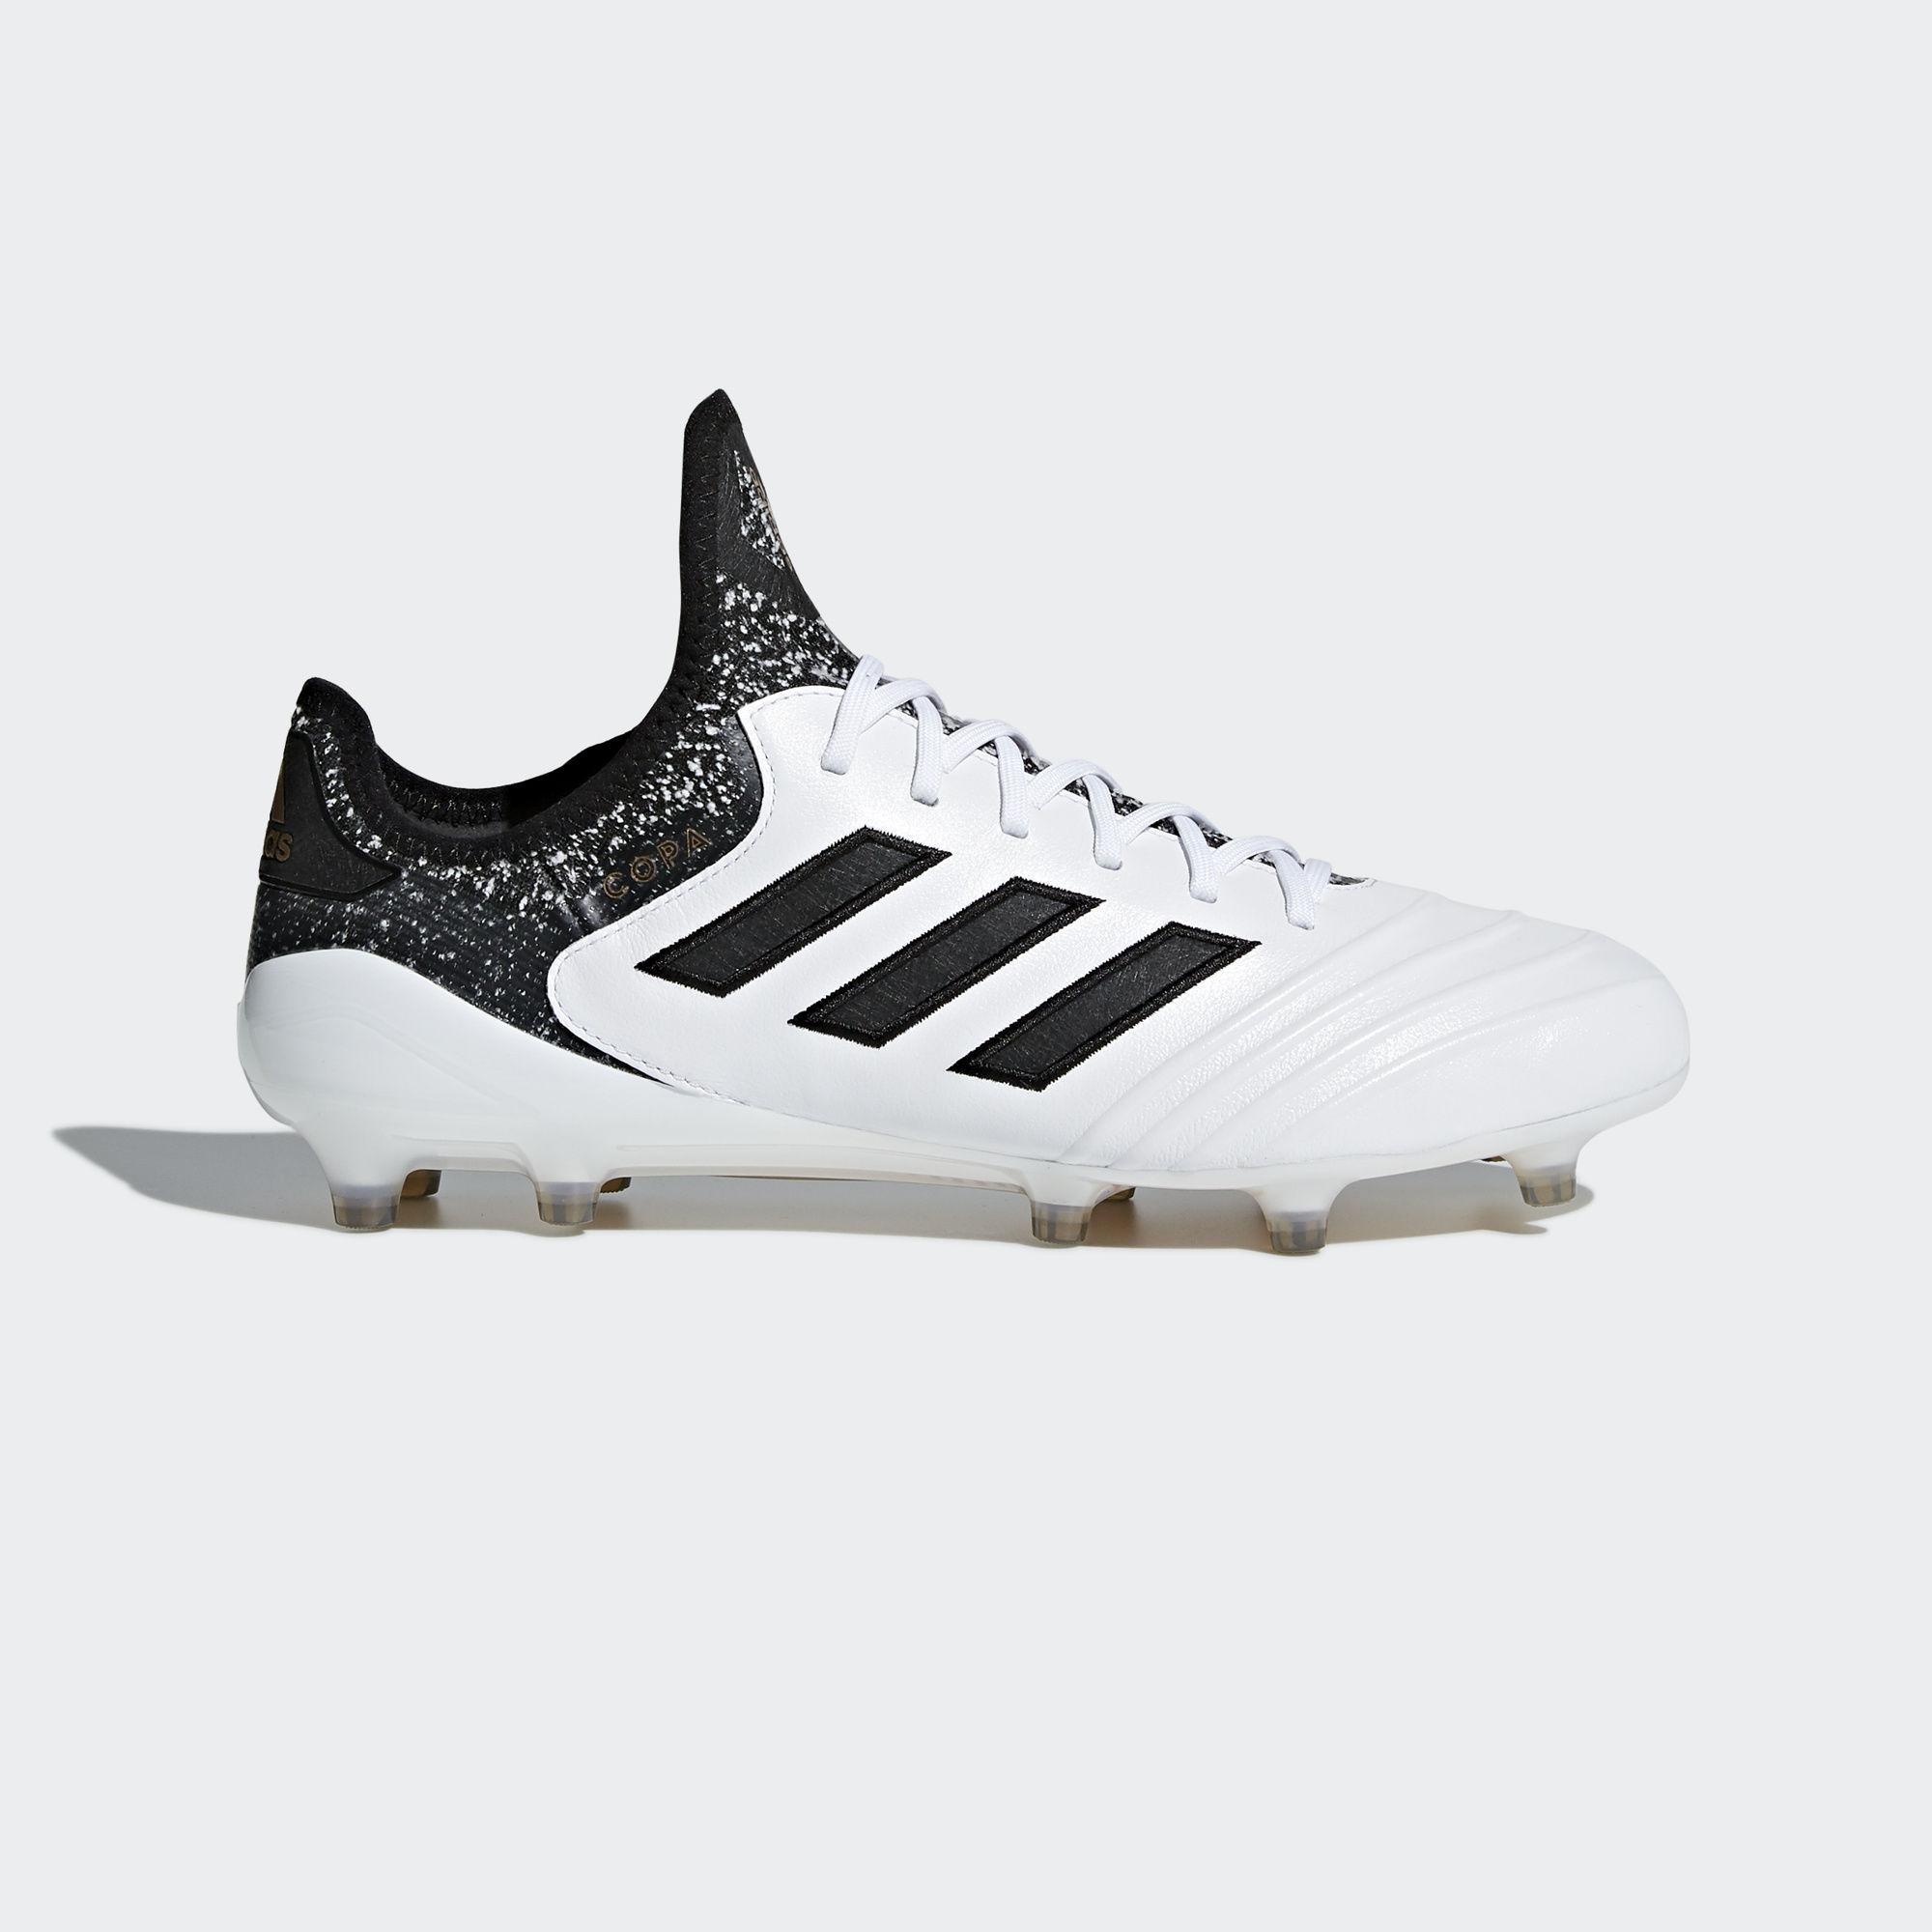 adidas Copa 18.1 FG - White/Black - Sky Stalker